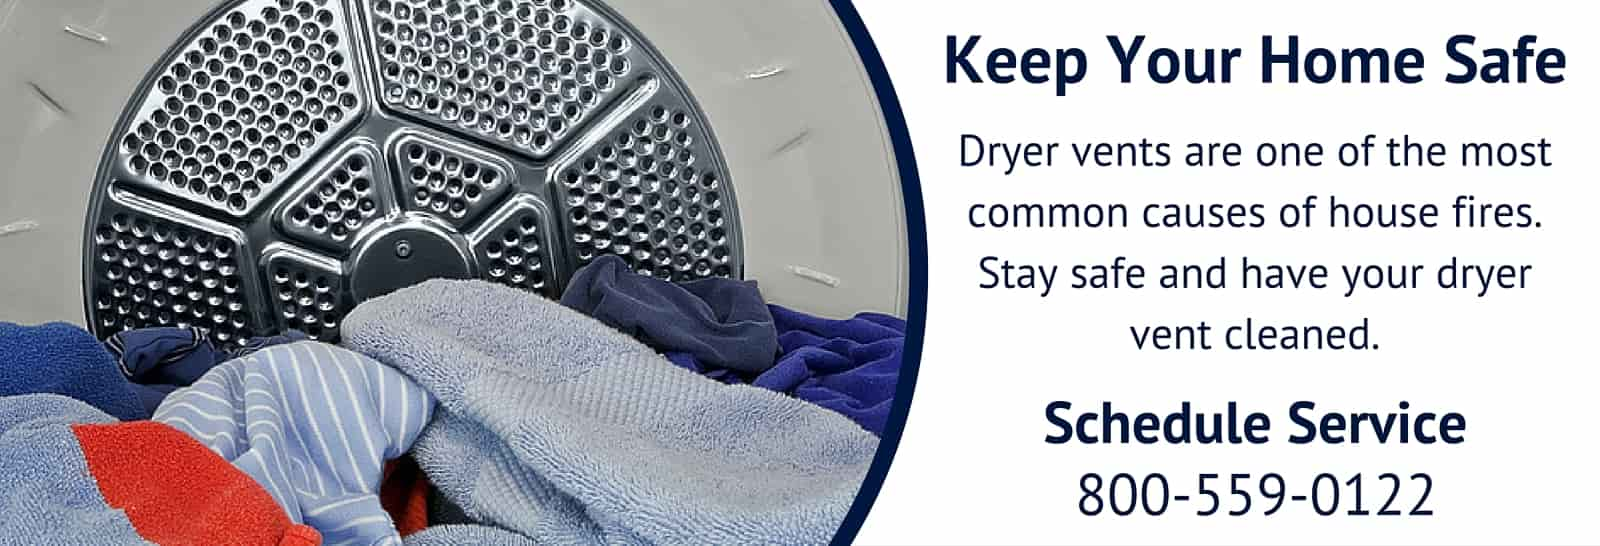 dryer-service